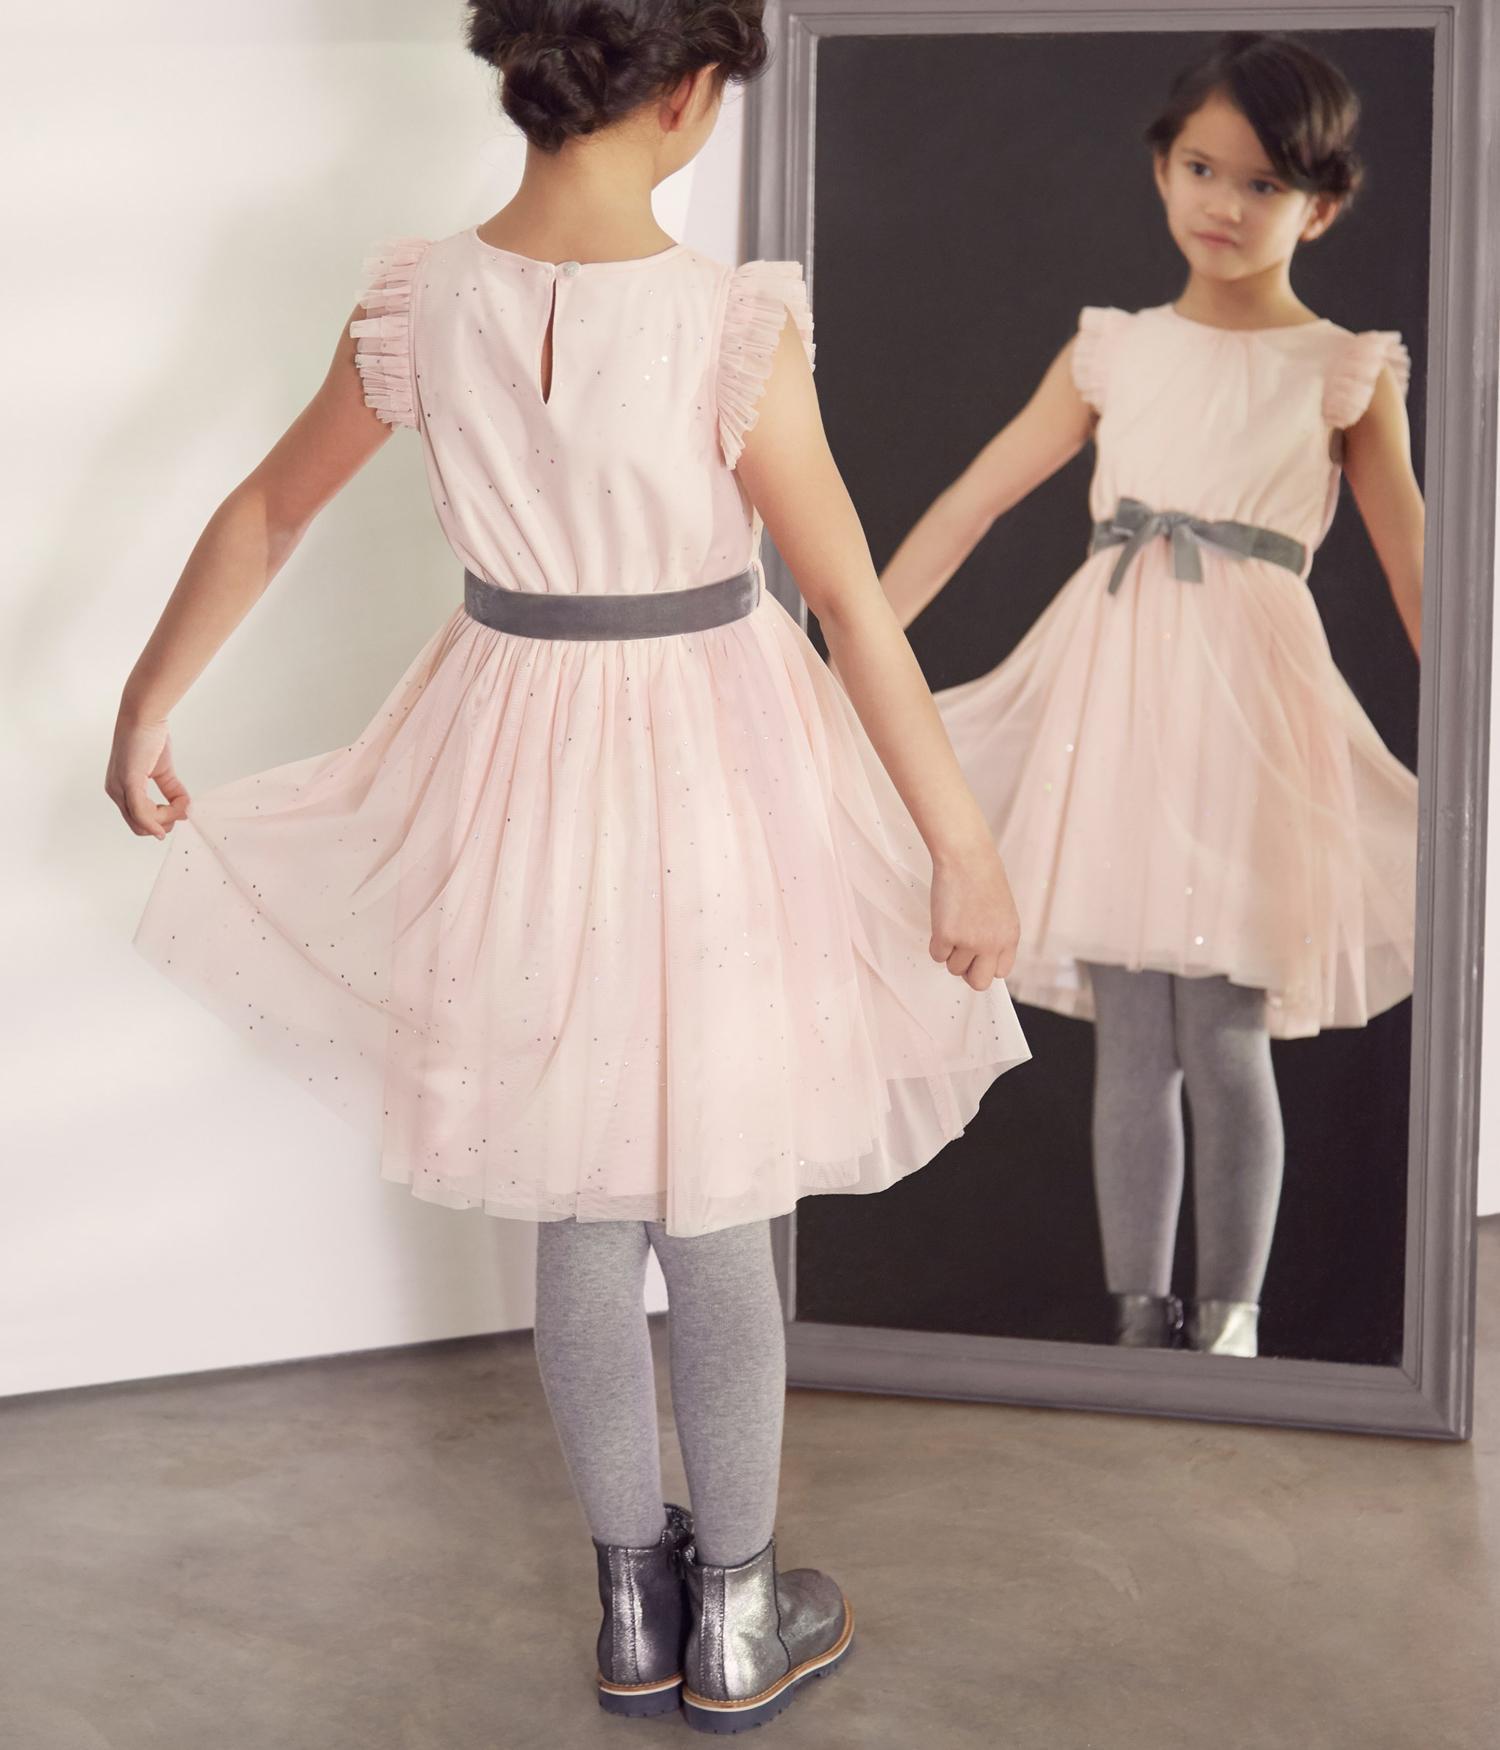 no l 2015 jolies tenues pour enfants sages madame figaro. Black Bedroom Furniture Sets. Home Design Ideas